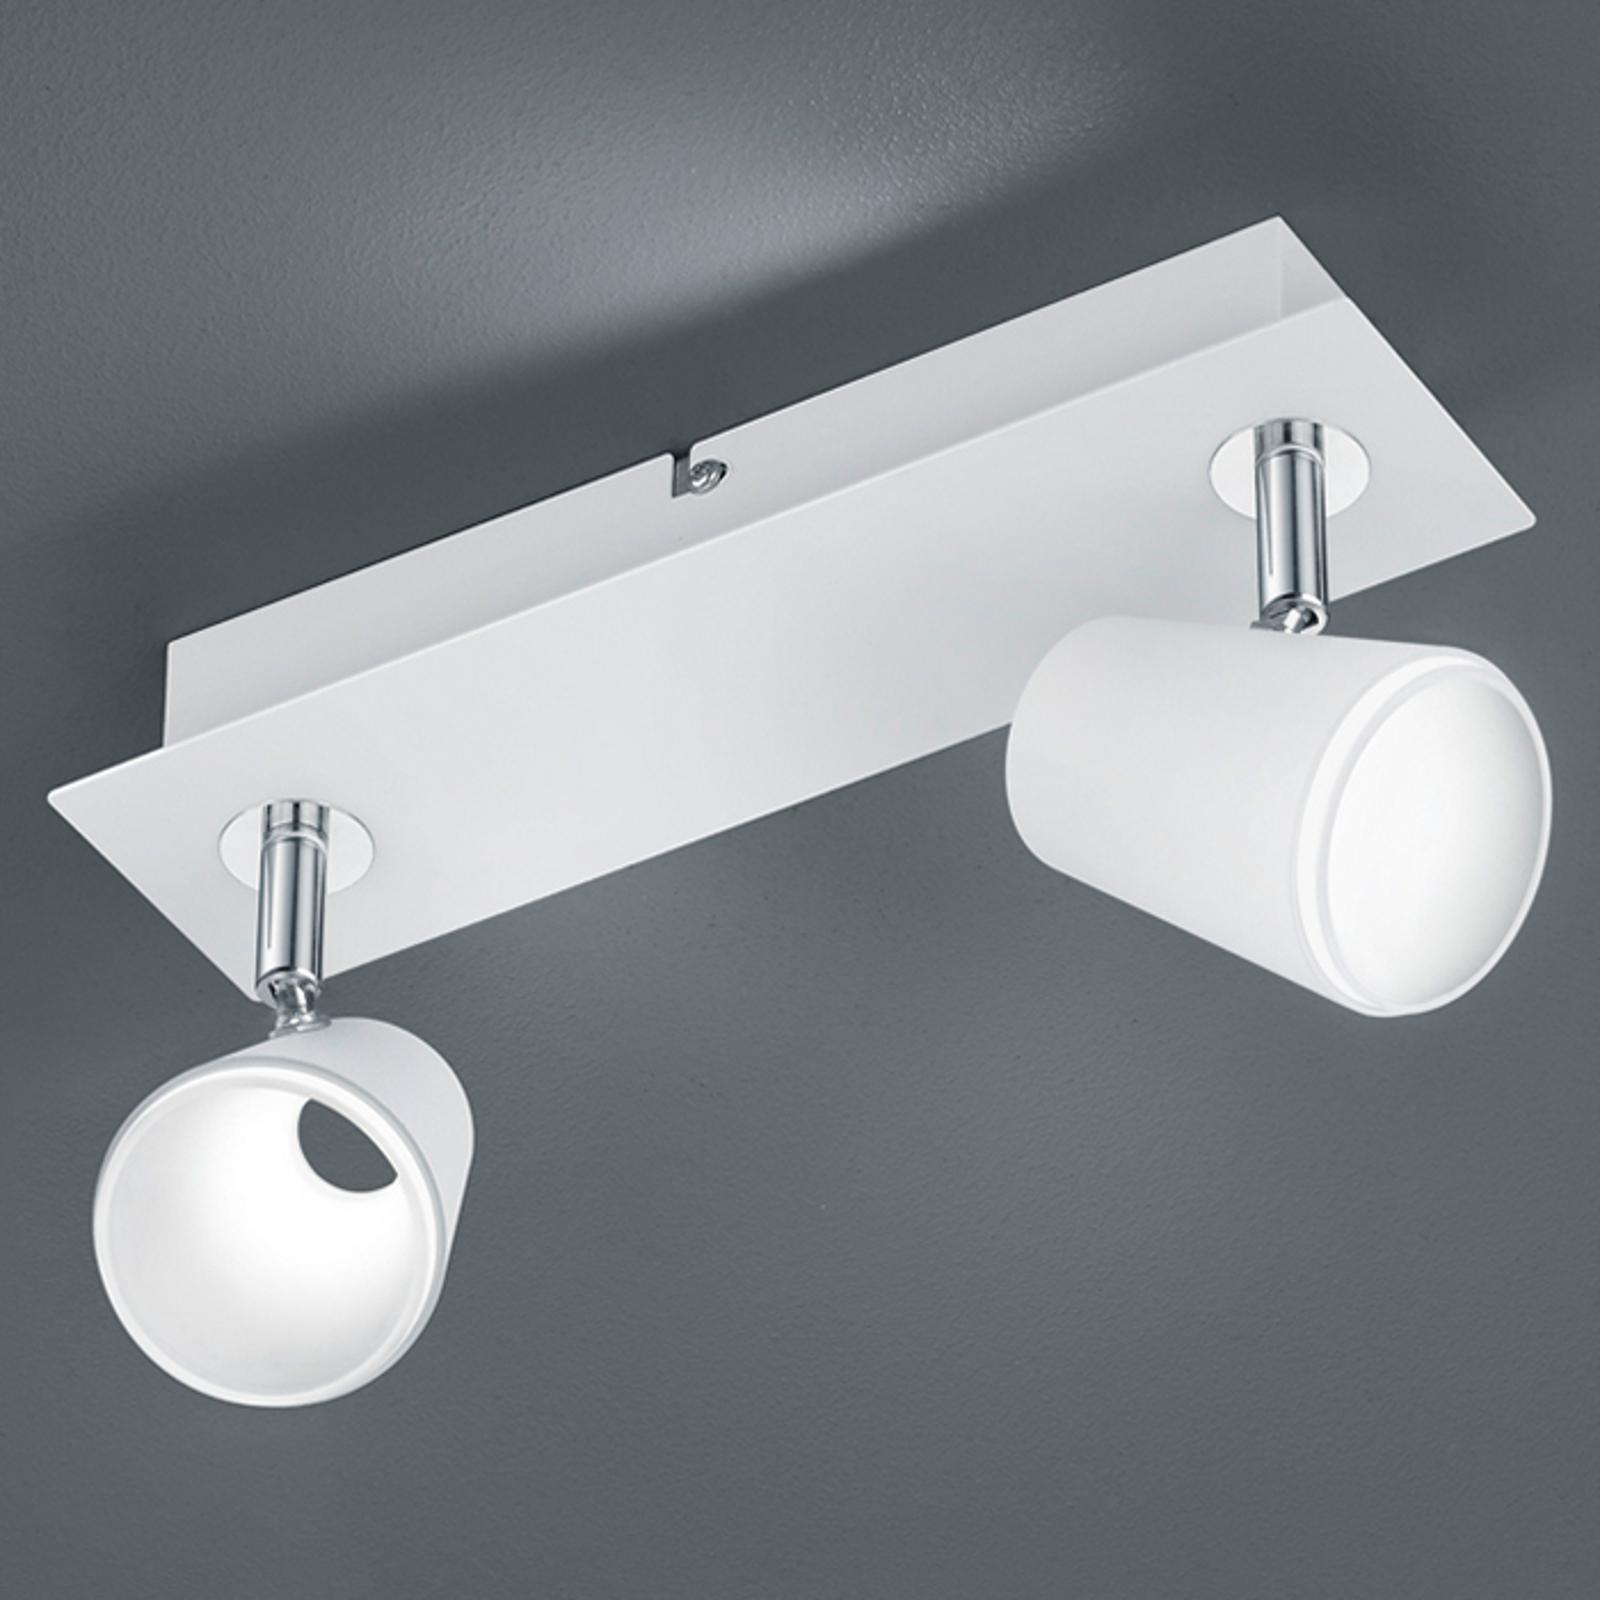 Hvit-kromfarget LED-vegglampe Narcos, 2 lys